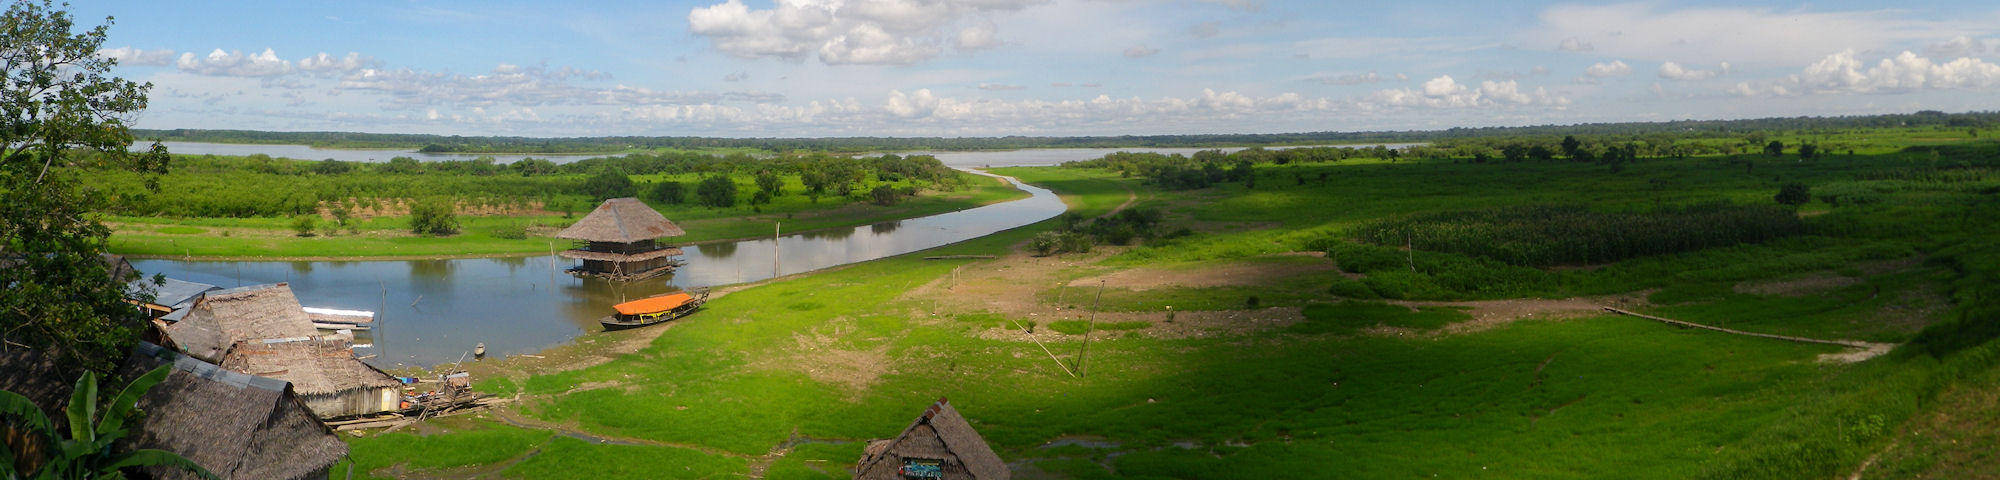 Iquitos - Río Itaya